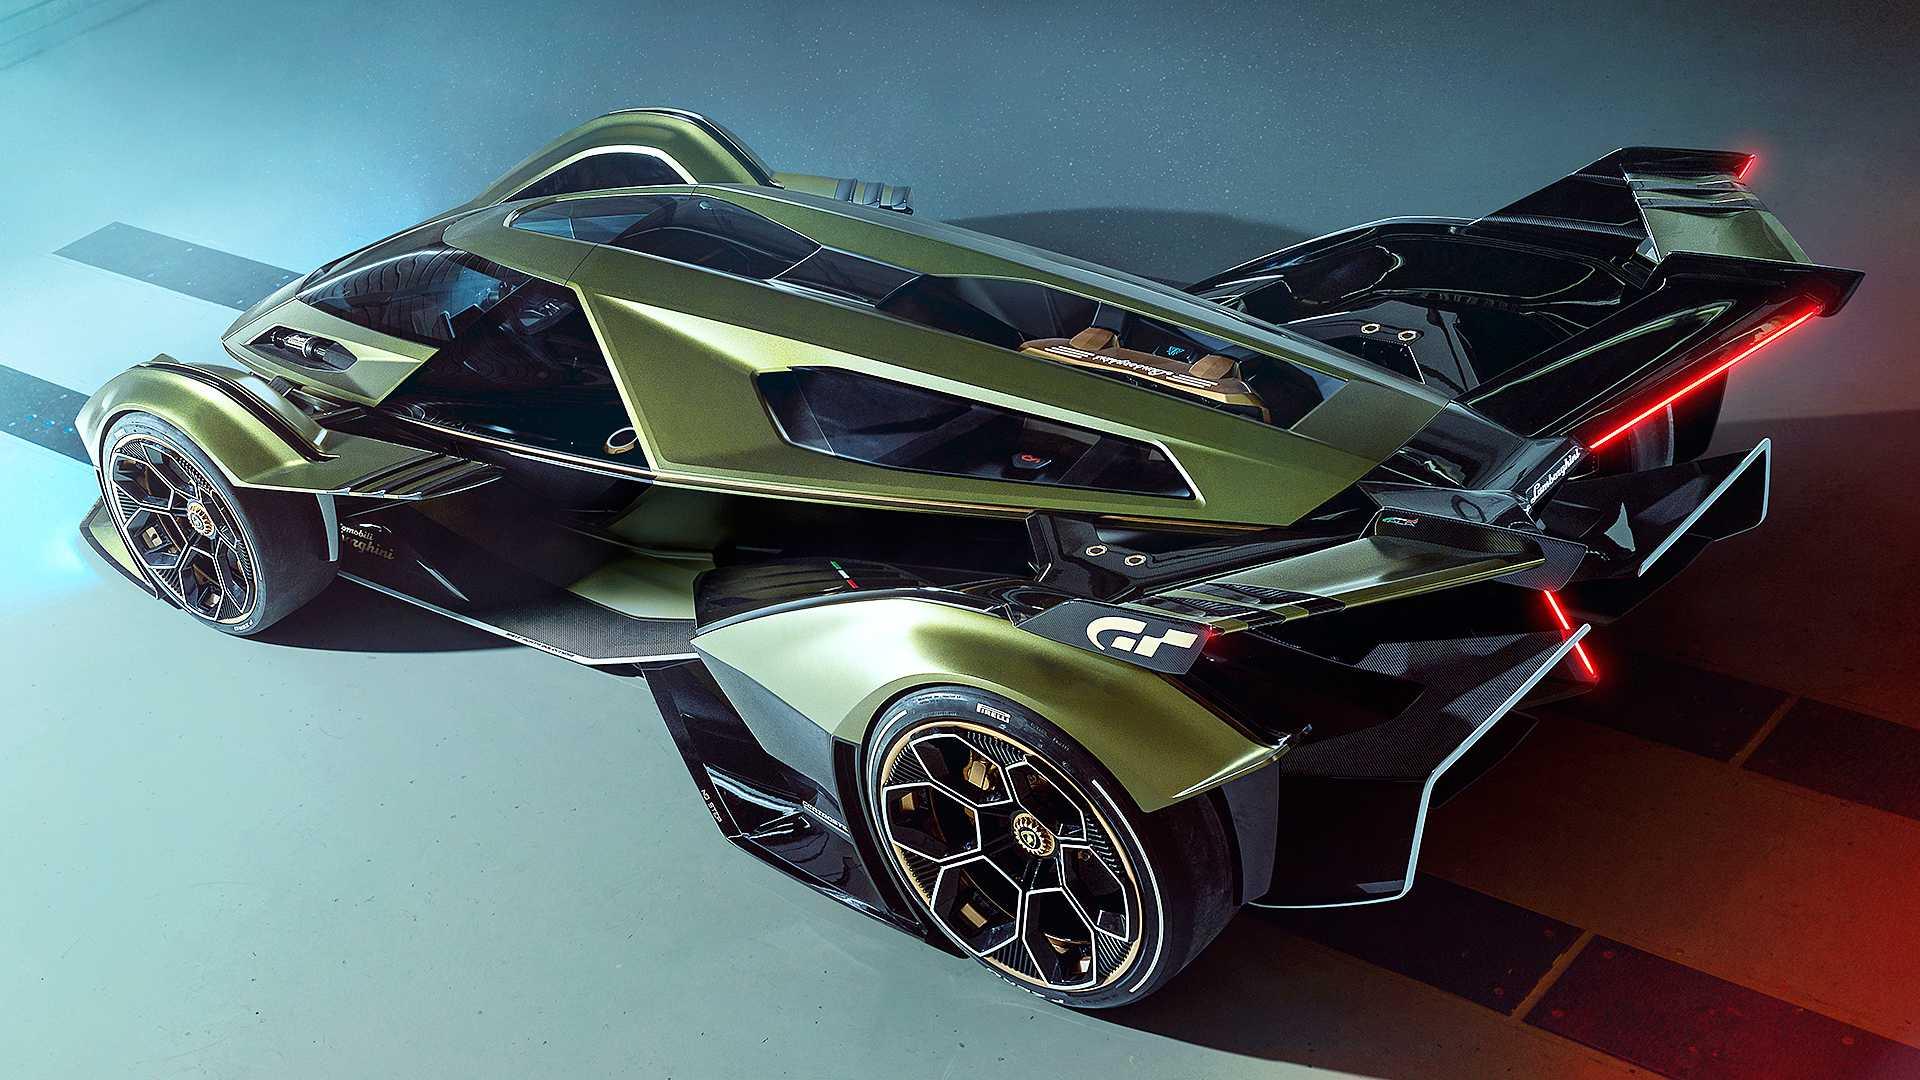 Lamborghini-V12-Vision-Gran-Turismo-6